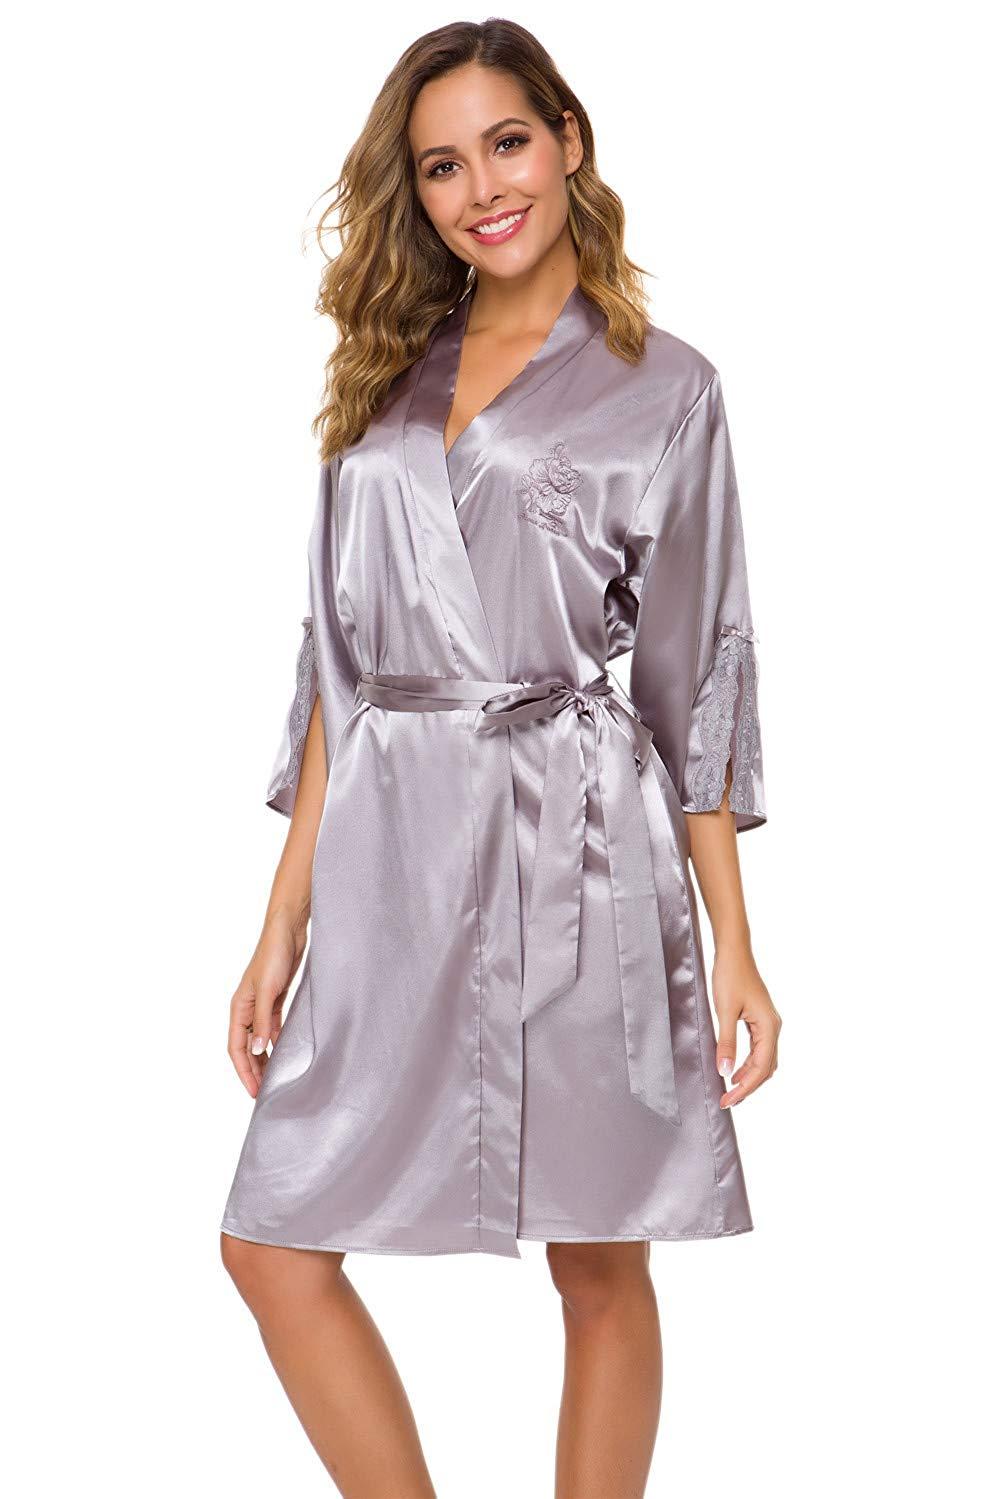 Alcea Rosea Kimono Robes for Women Satin Silky Short Bridesmaid and Bride Robe for Wedding Party with Pockets